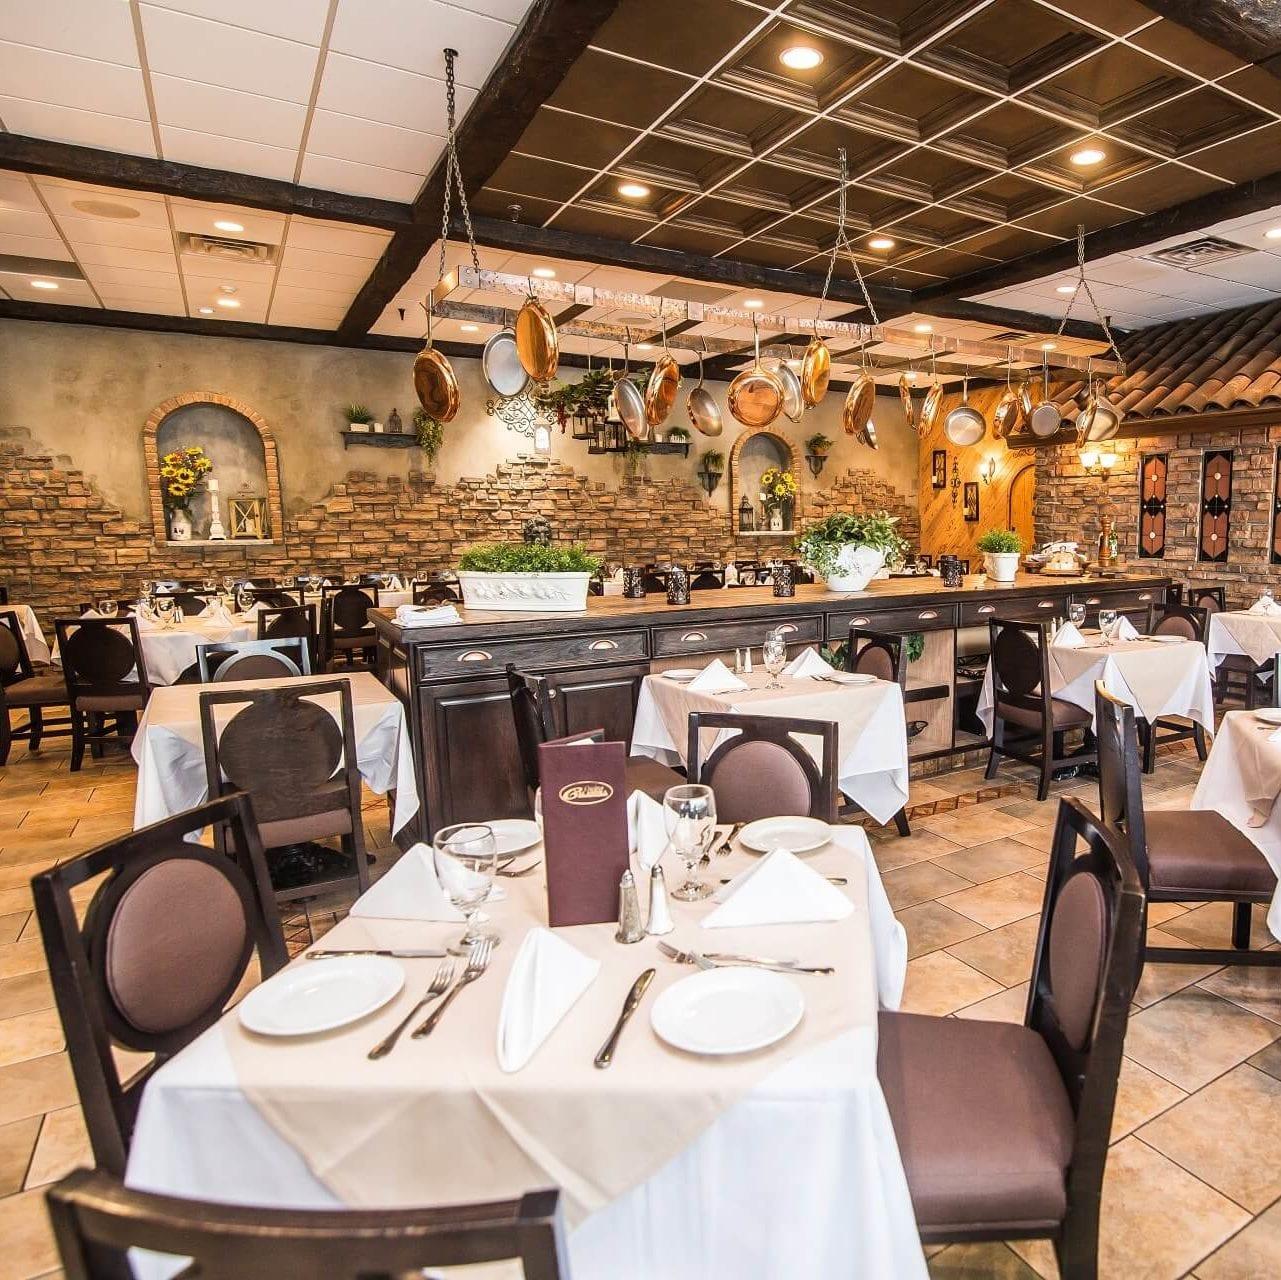 Cucina Calandra Restaurant Open on Thanksgiving